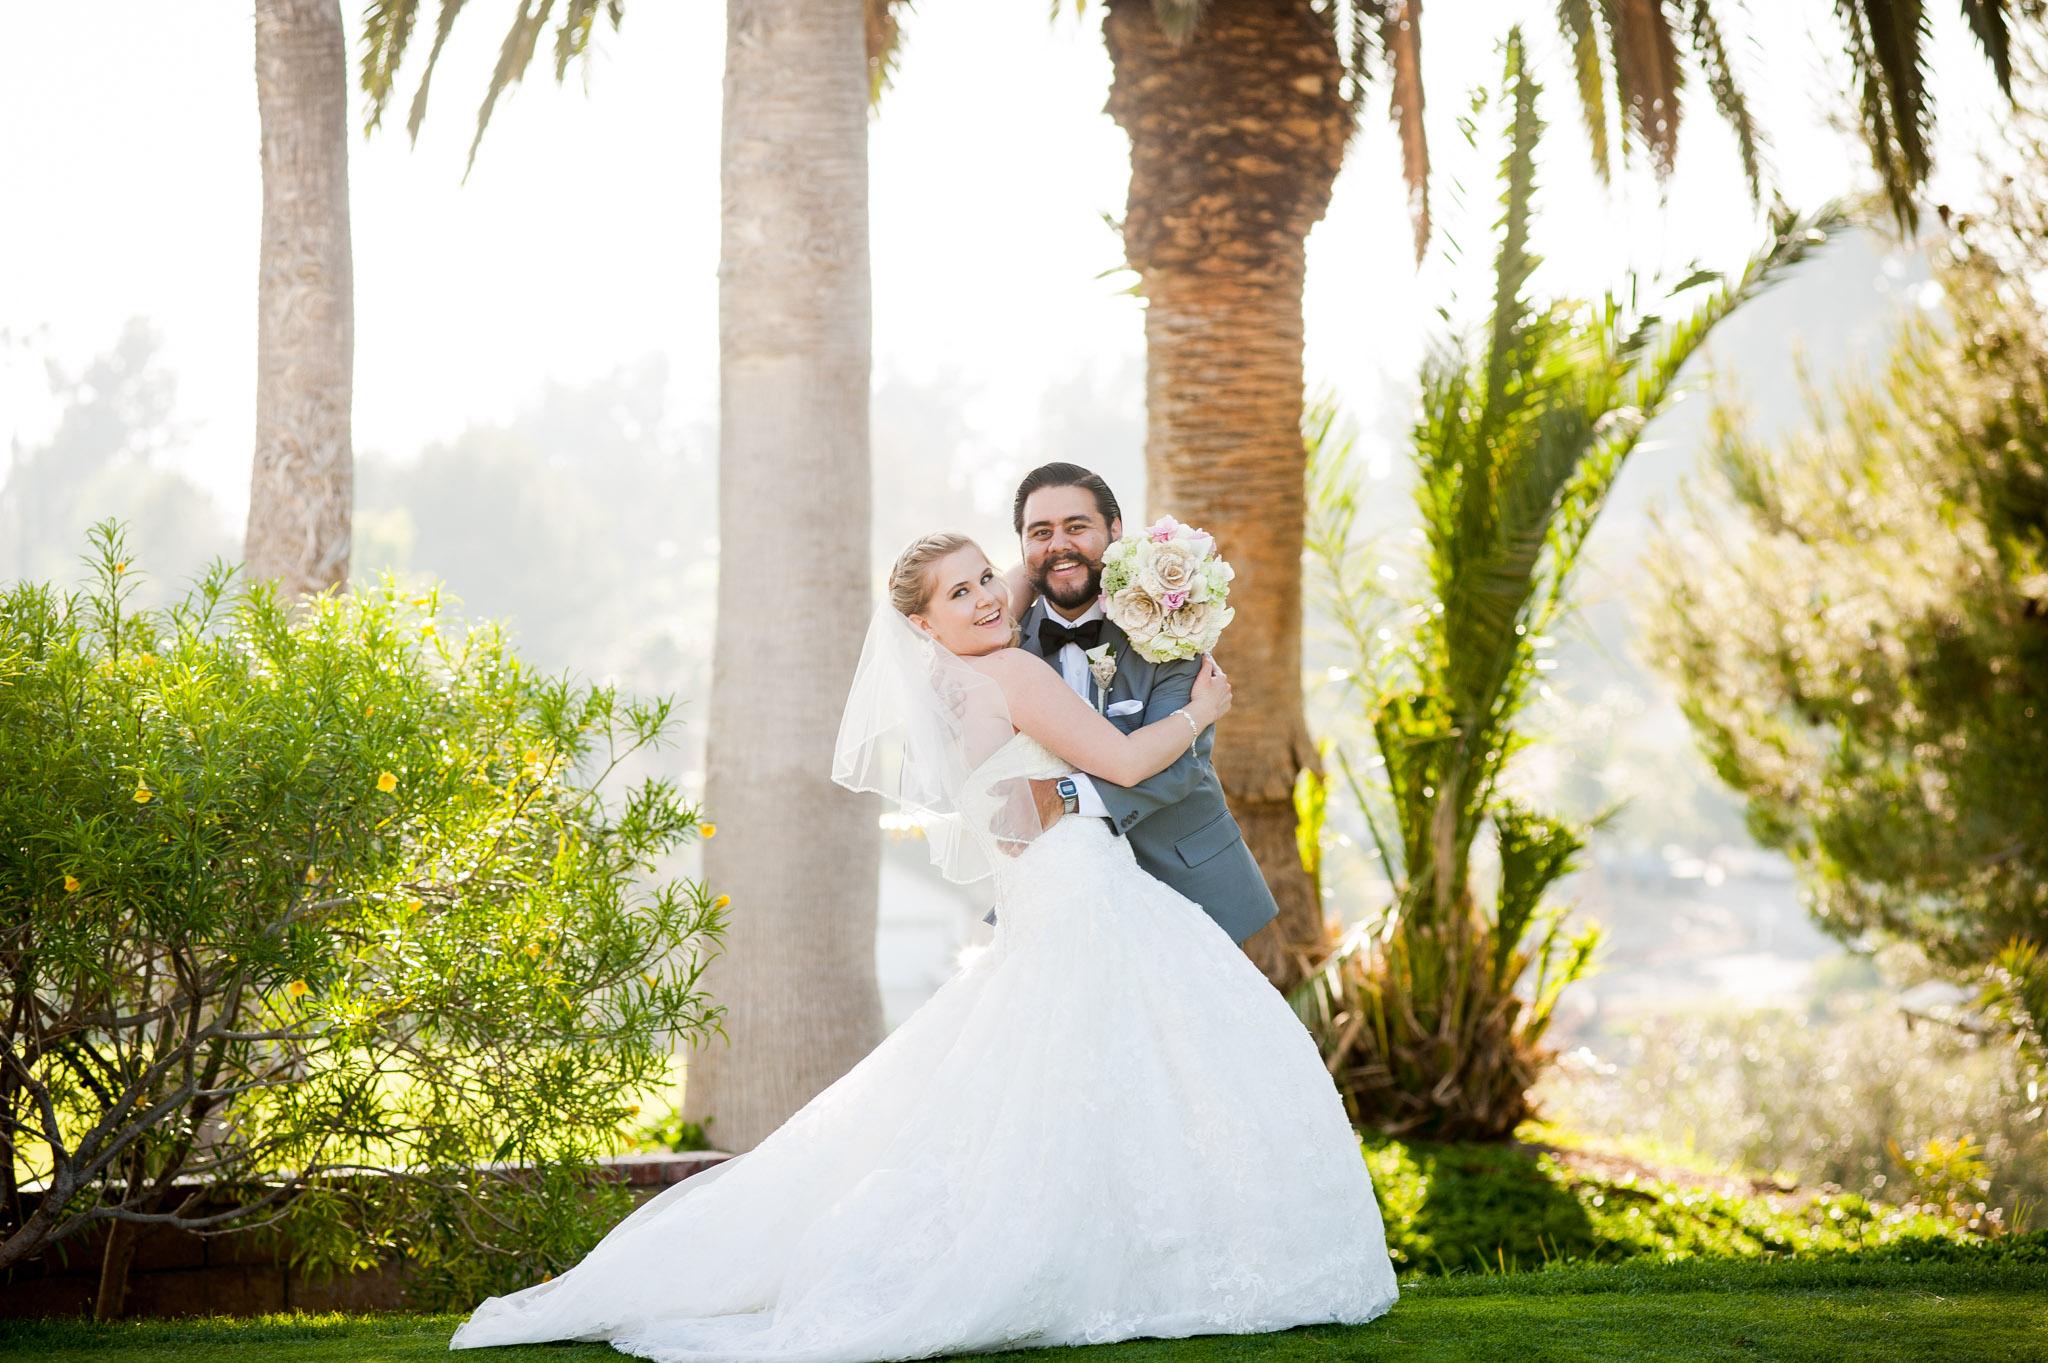 Asistencia mission redlands wedding dress